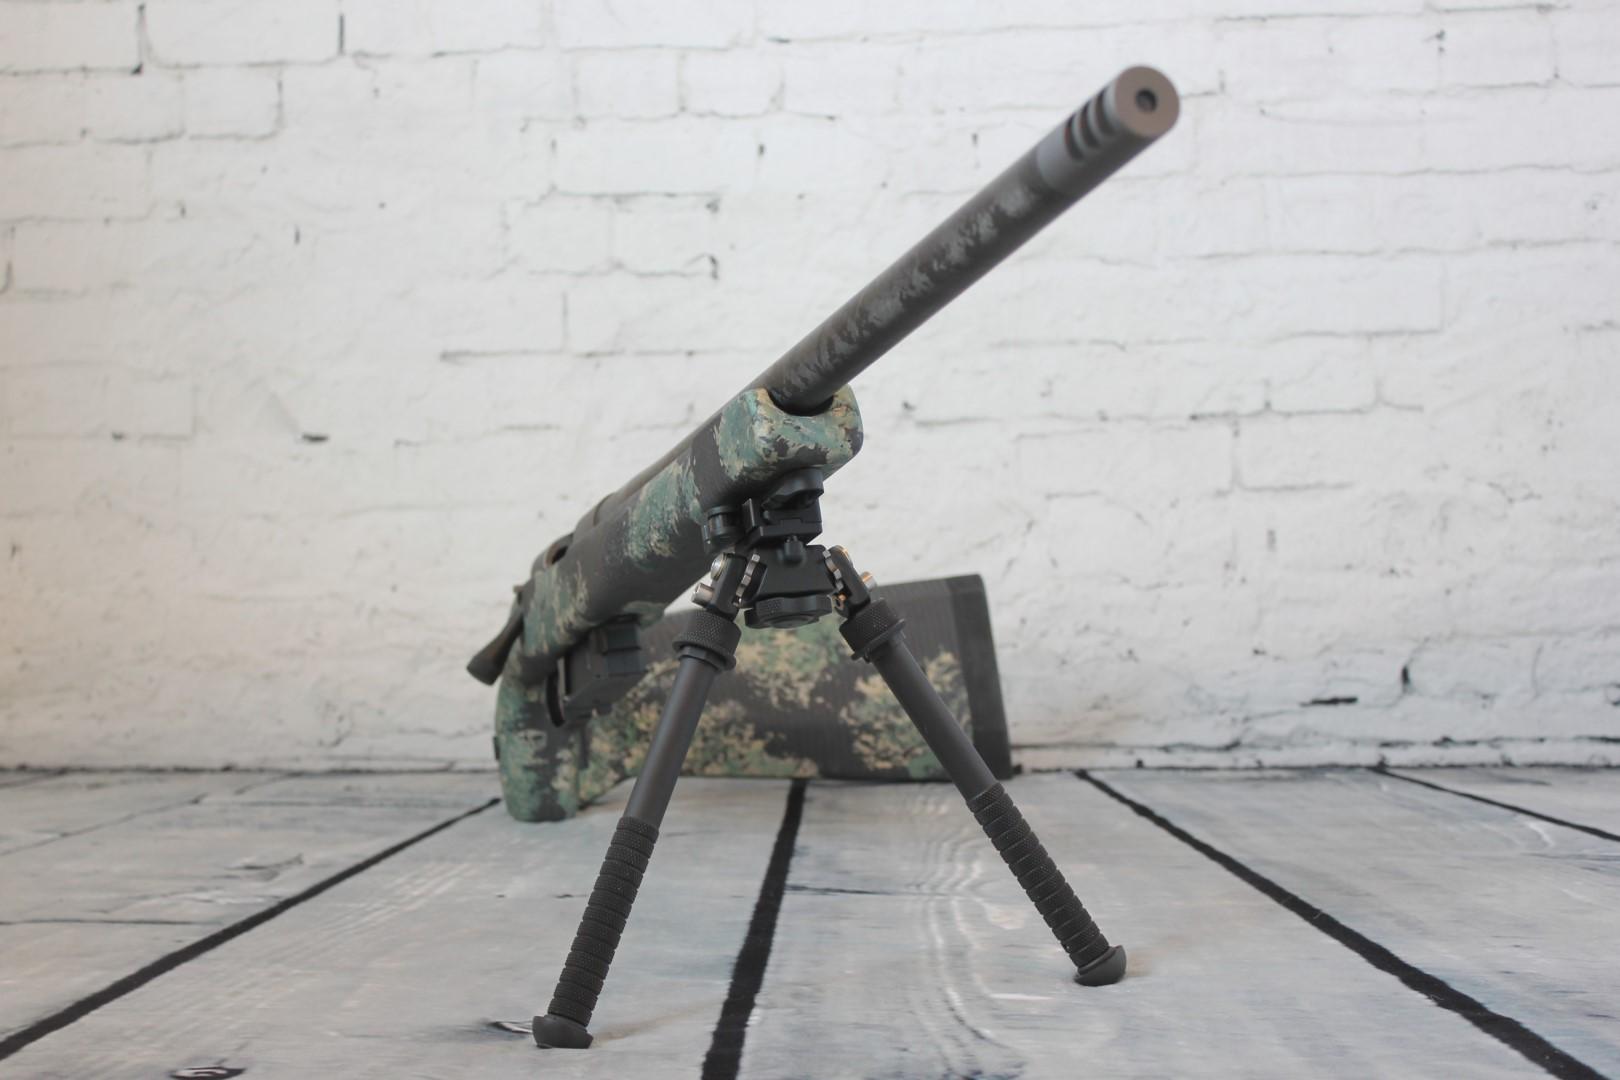 stowaway rifle